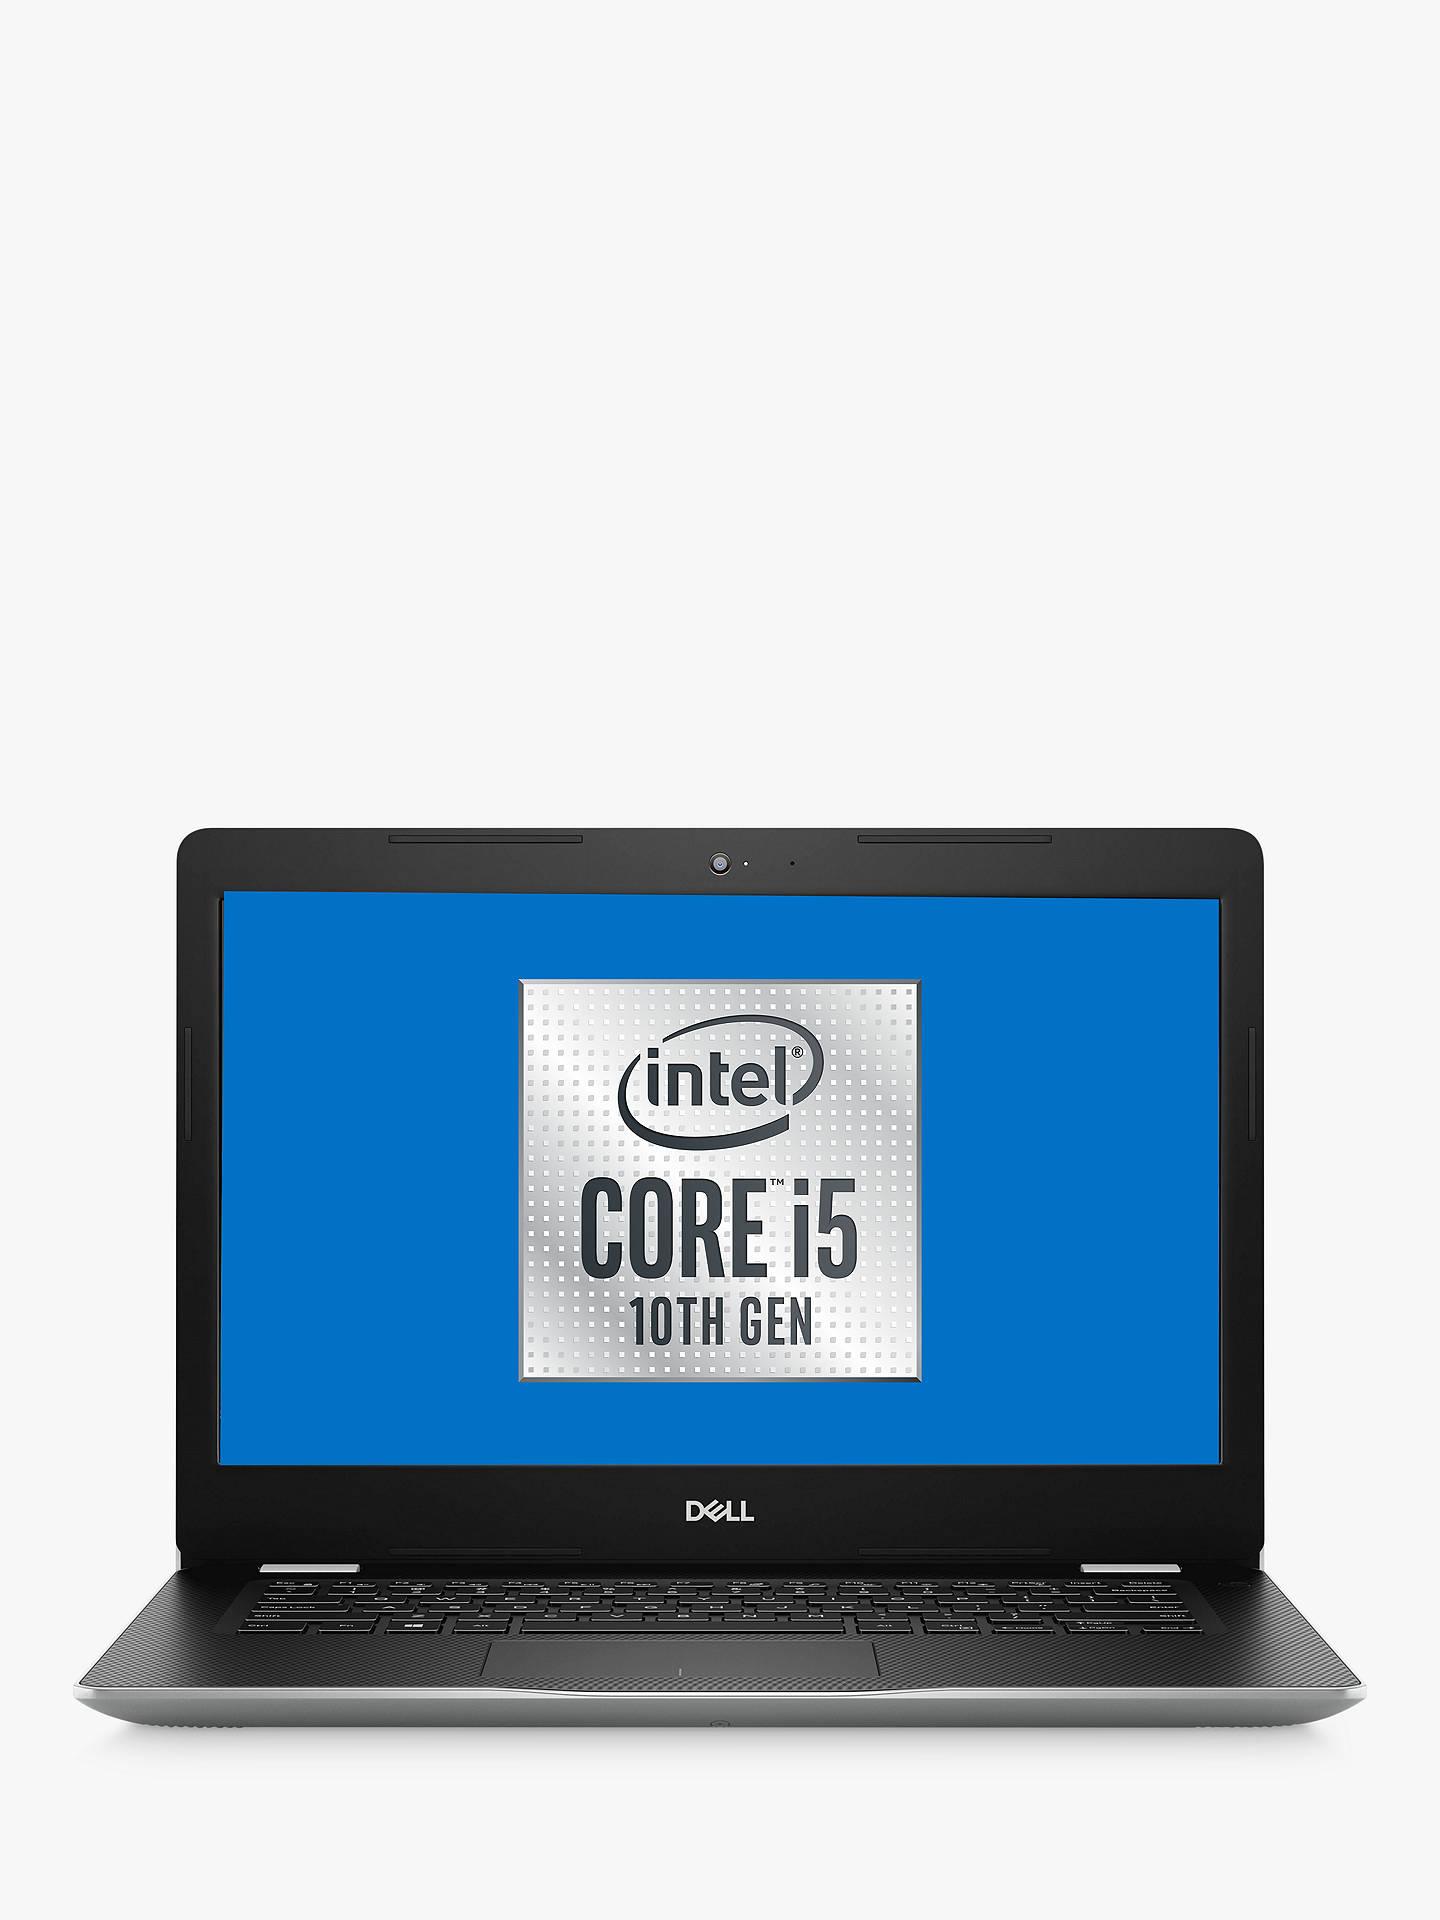 Dell Inspiron 14 3493 Laptop Intel Core I5 Processor 8gb Ram 512gb Ssd 14 Full Hd Platinum Silver At John Lewis Partners